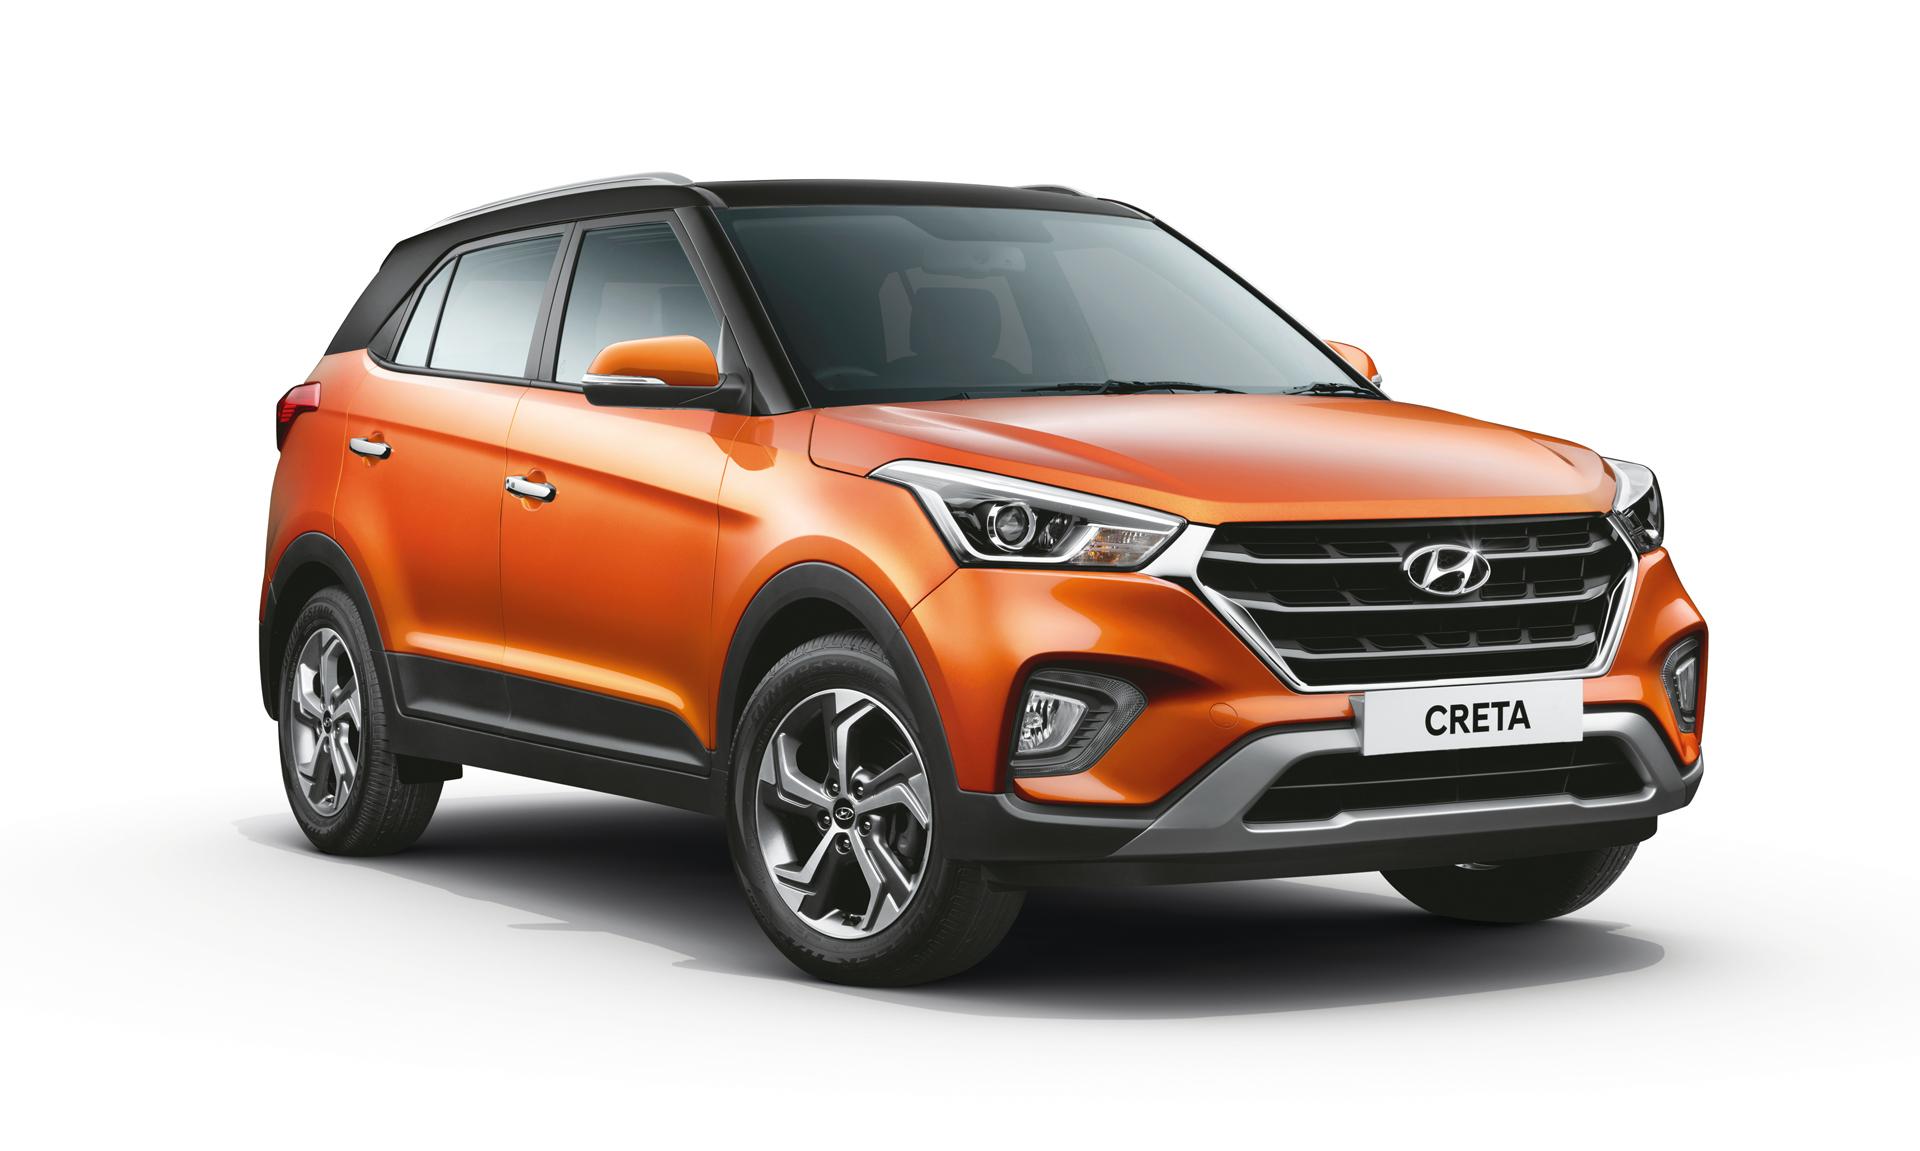 Hyundai Creta 2018 SX 1.6 Dual Tone Petrol Image